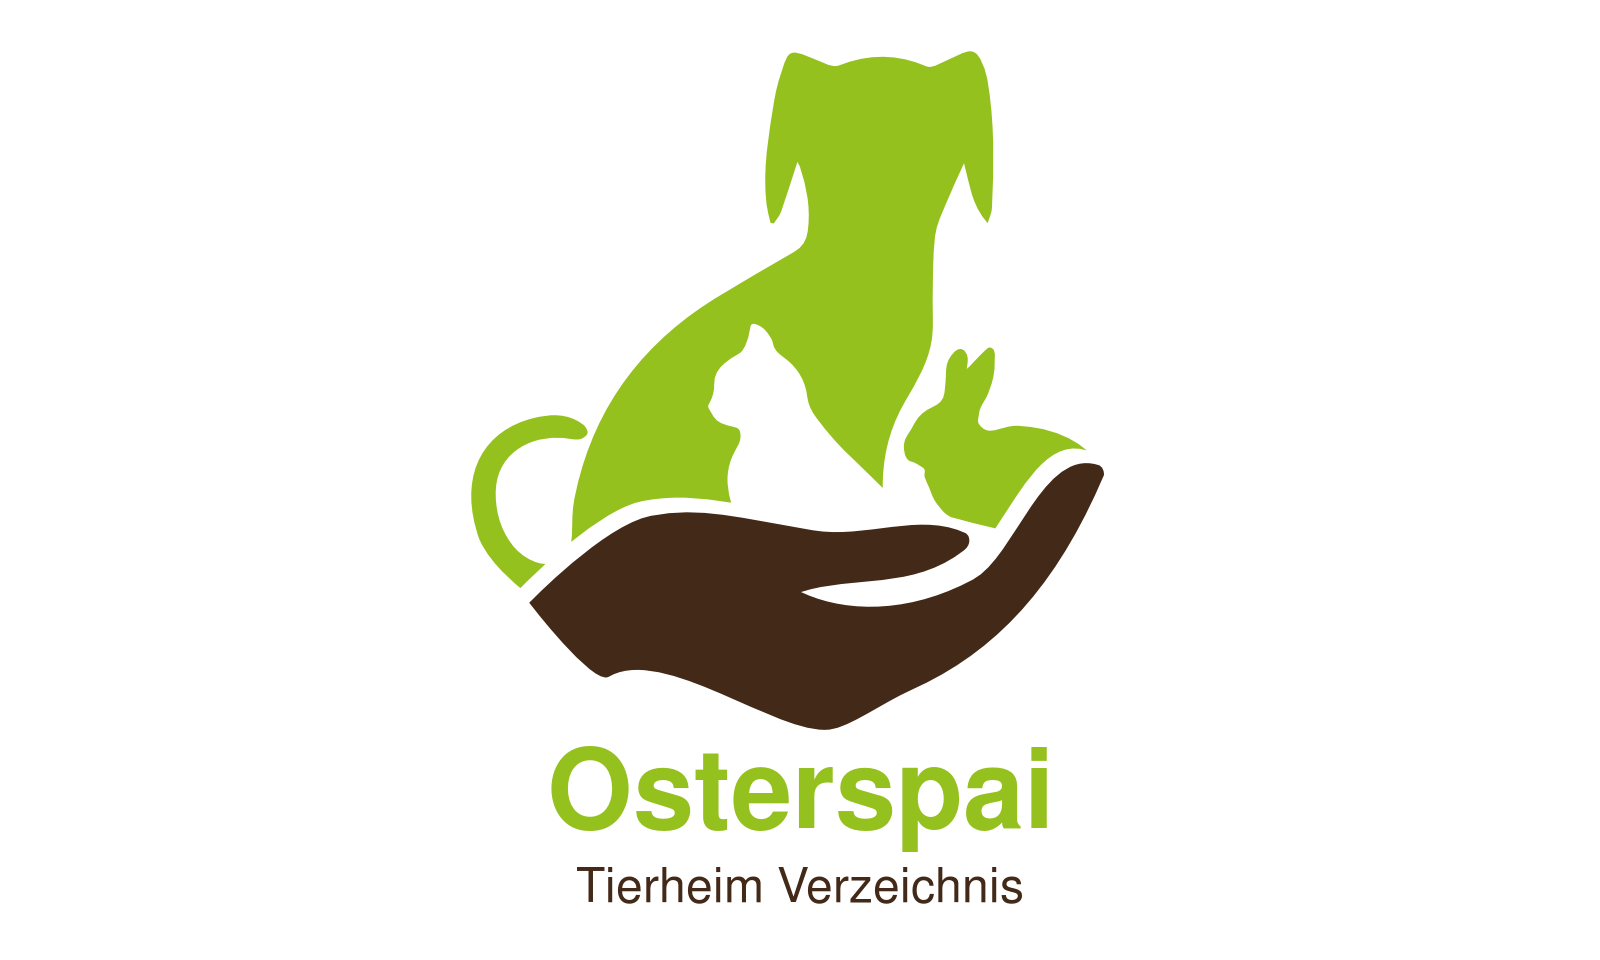 Tierheim Osterspai